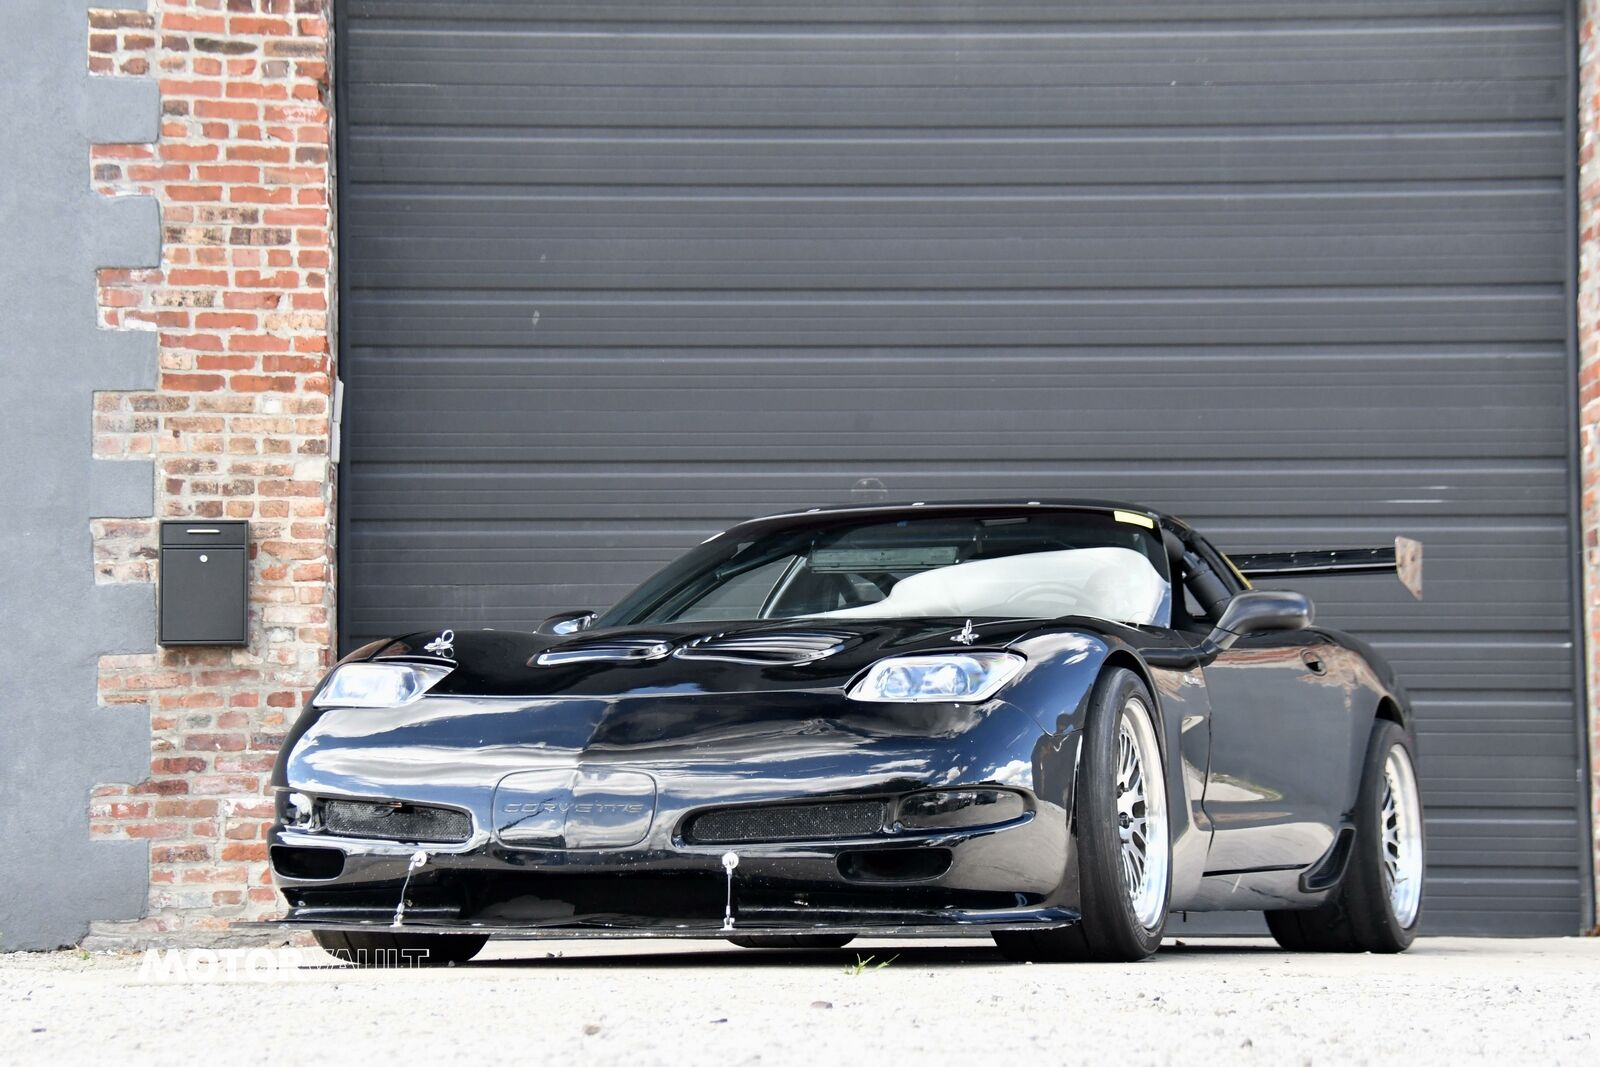 1999 Black Chevrolet Corvette   | C5 Corvette Photo 10